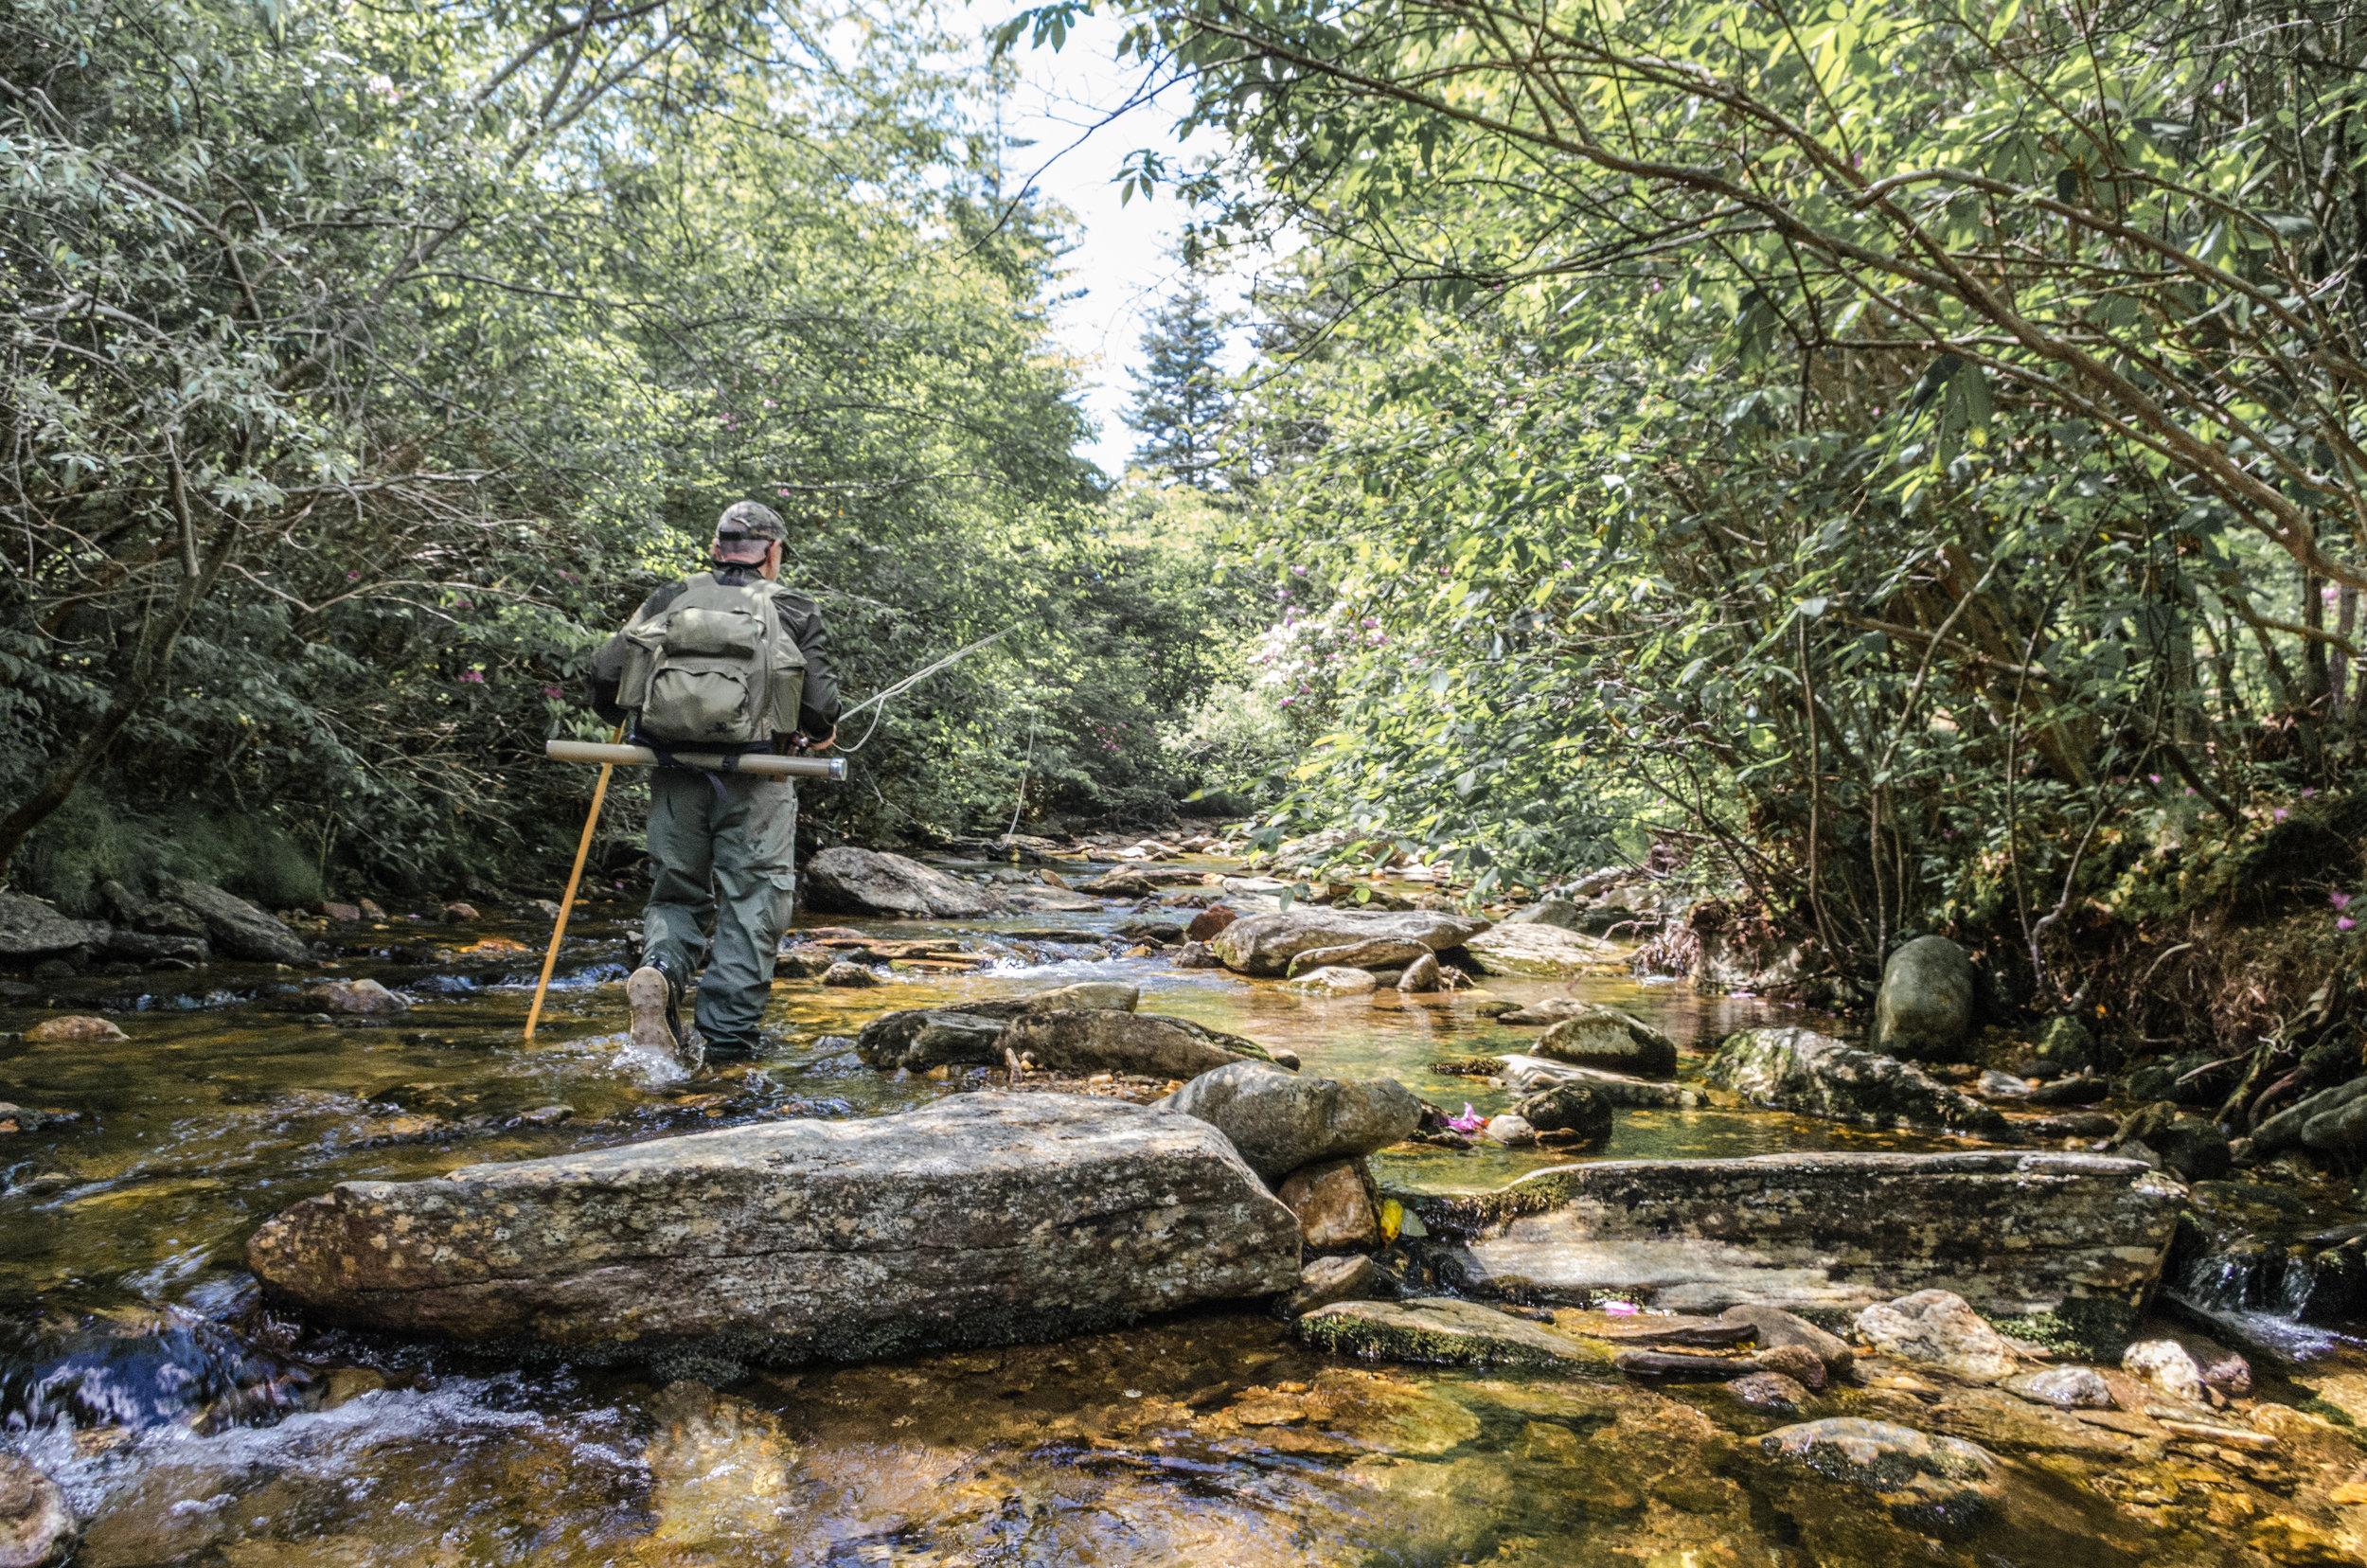 Fly Fishing Small Streams